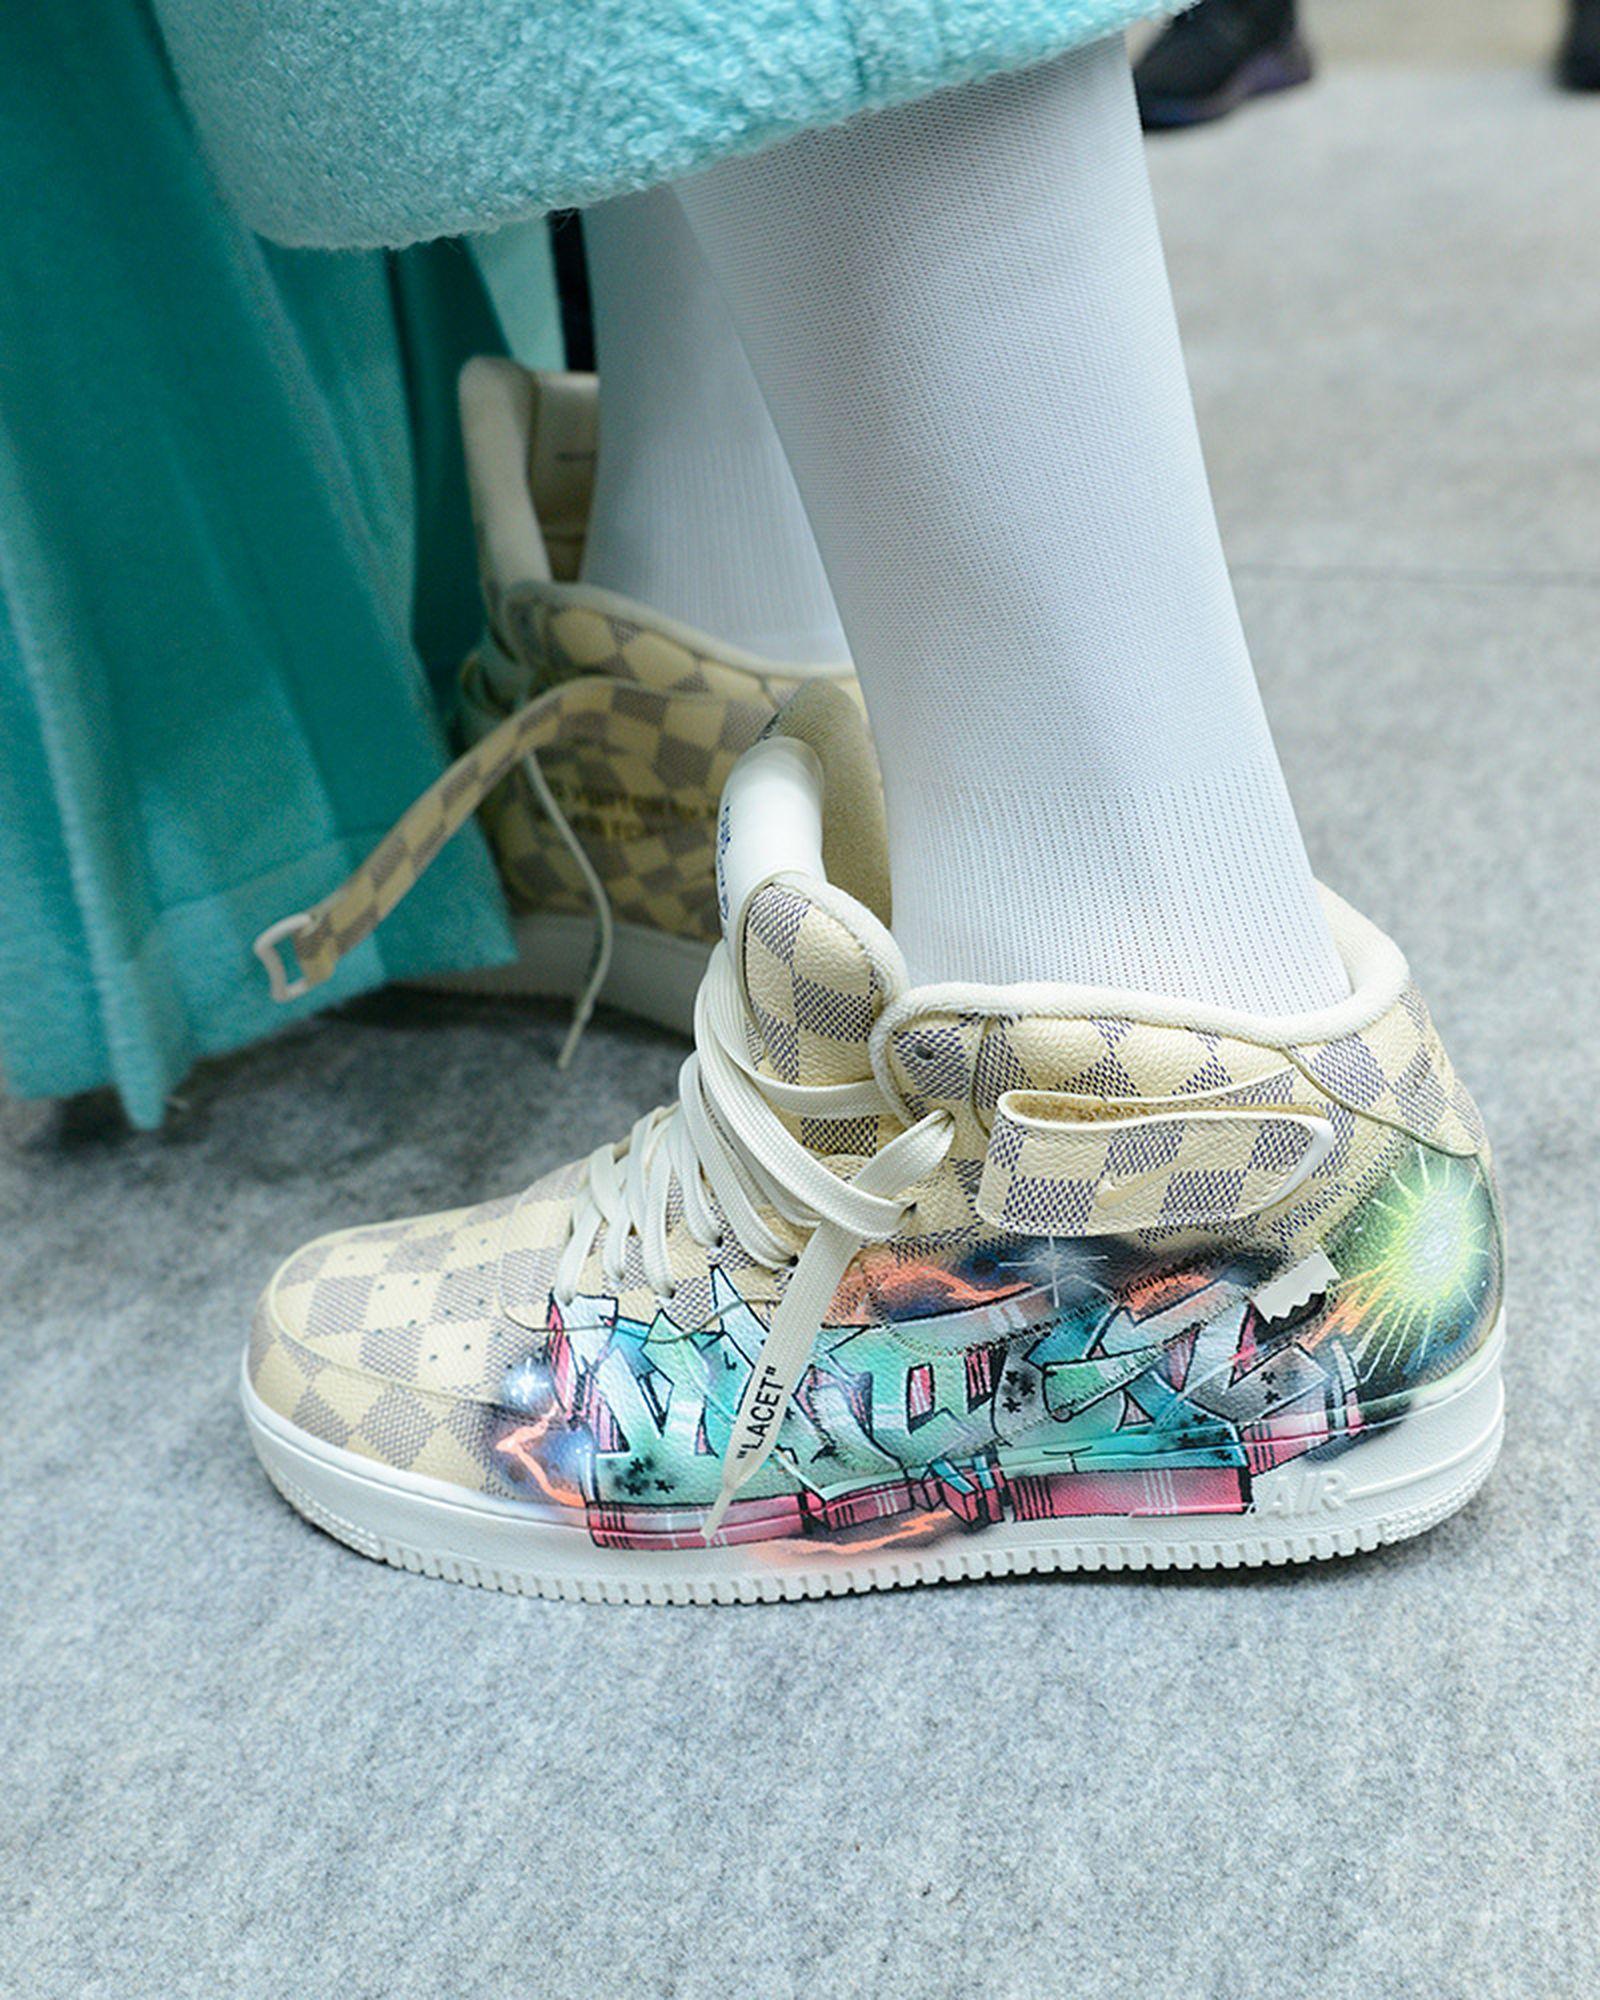 louis-vuitton-nike-virgil-abloh-sneaker-reveal-12